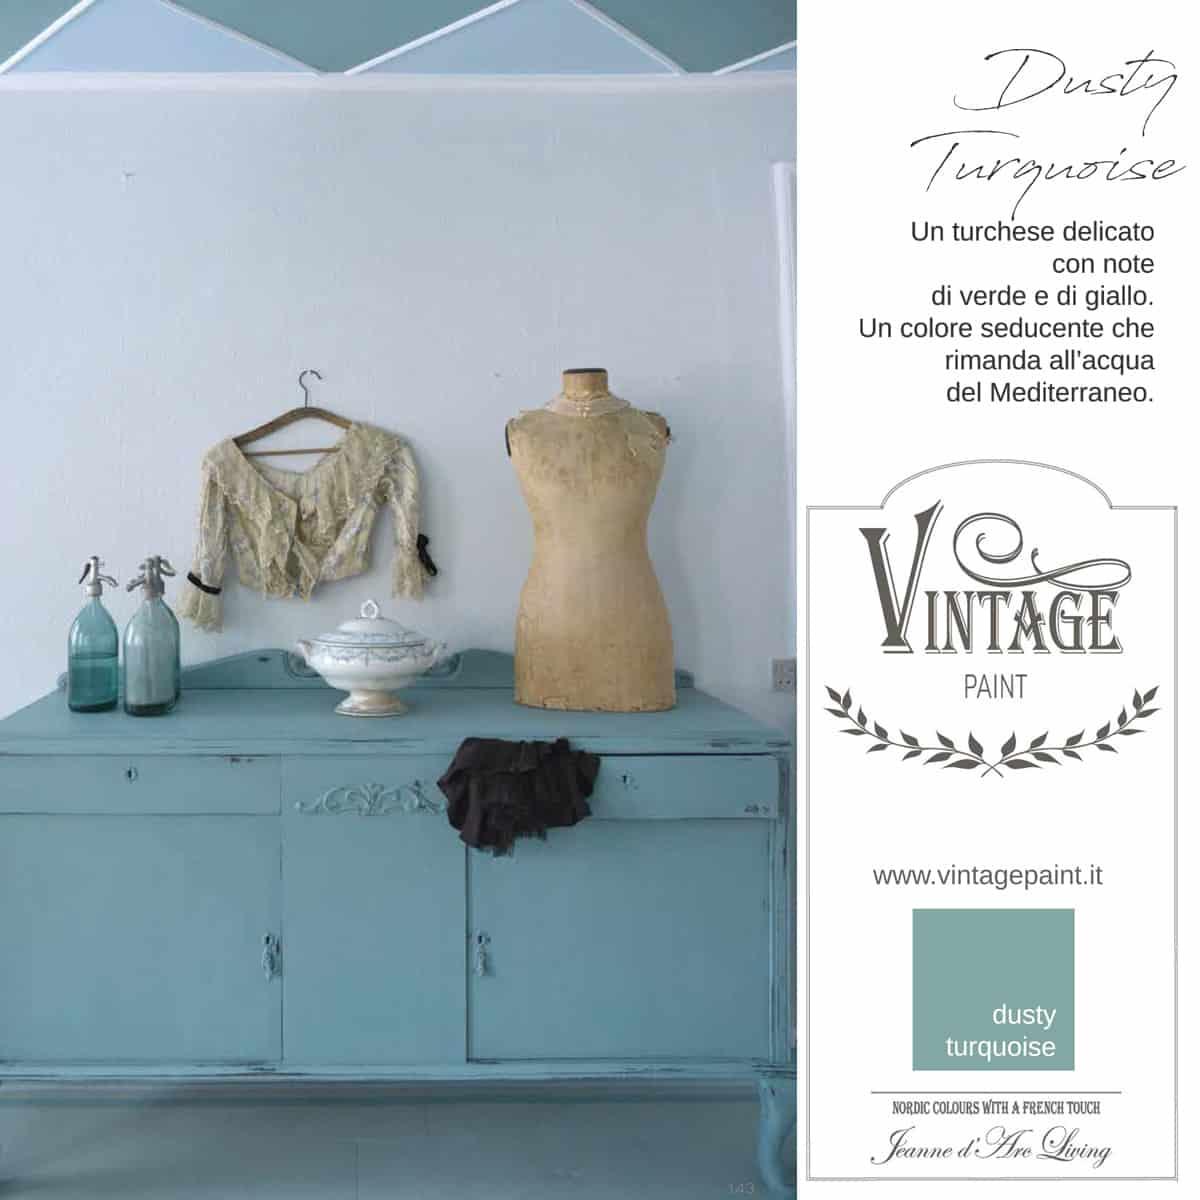 dusty turquoise turchese blu azzurro vintage chalk paint vernici shabby chic autentico look gesso